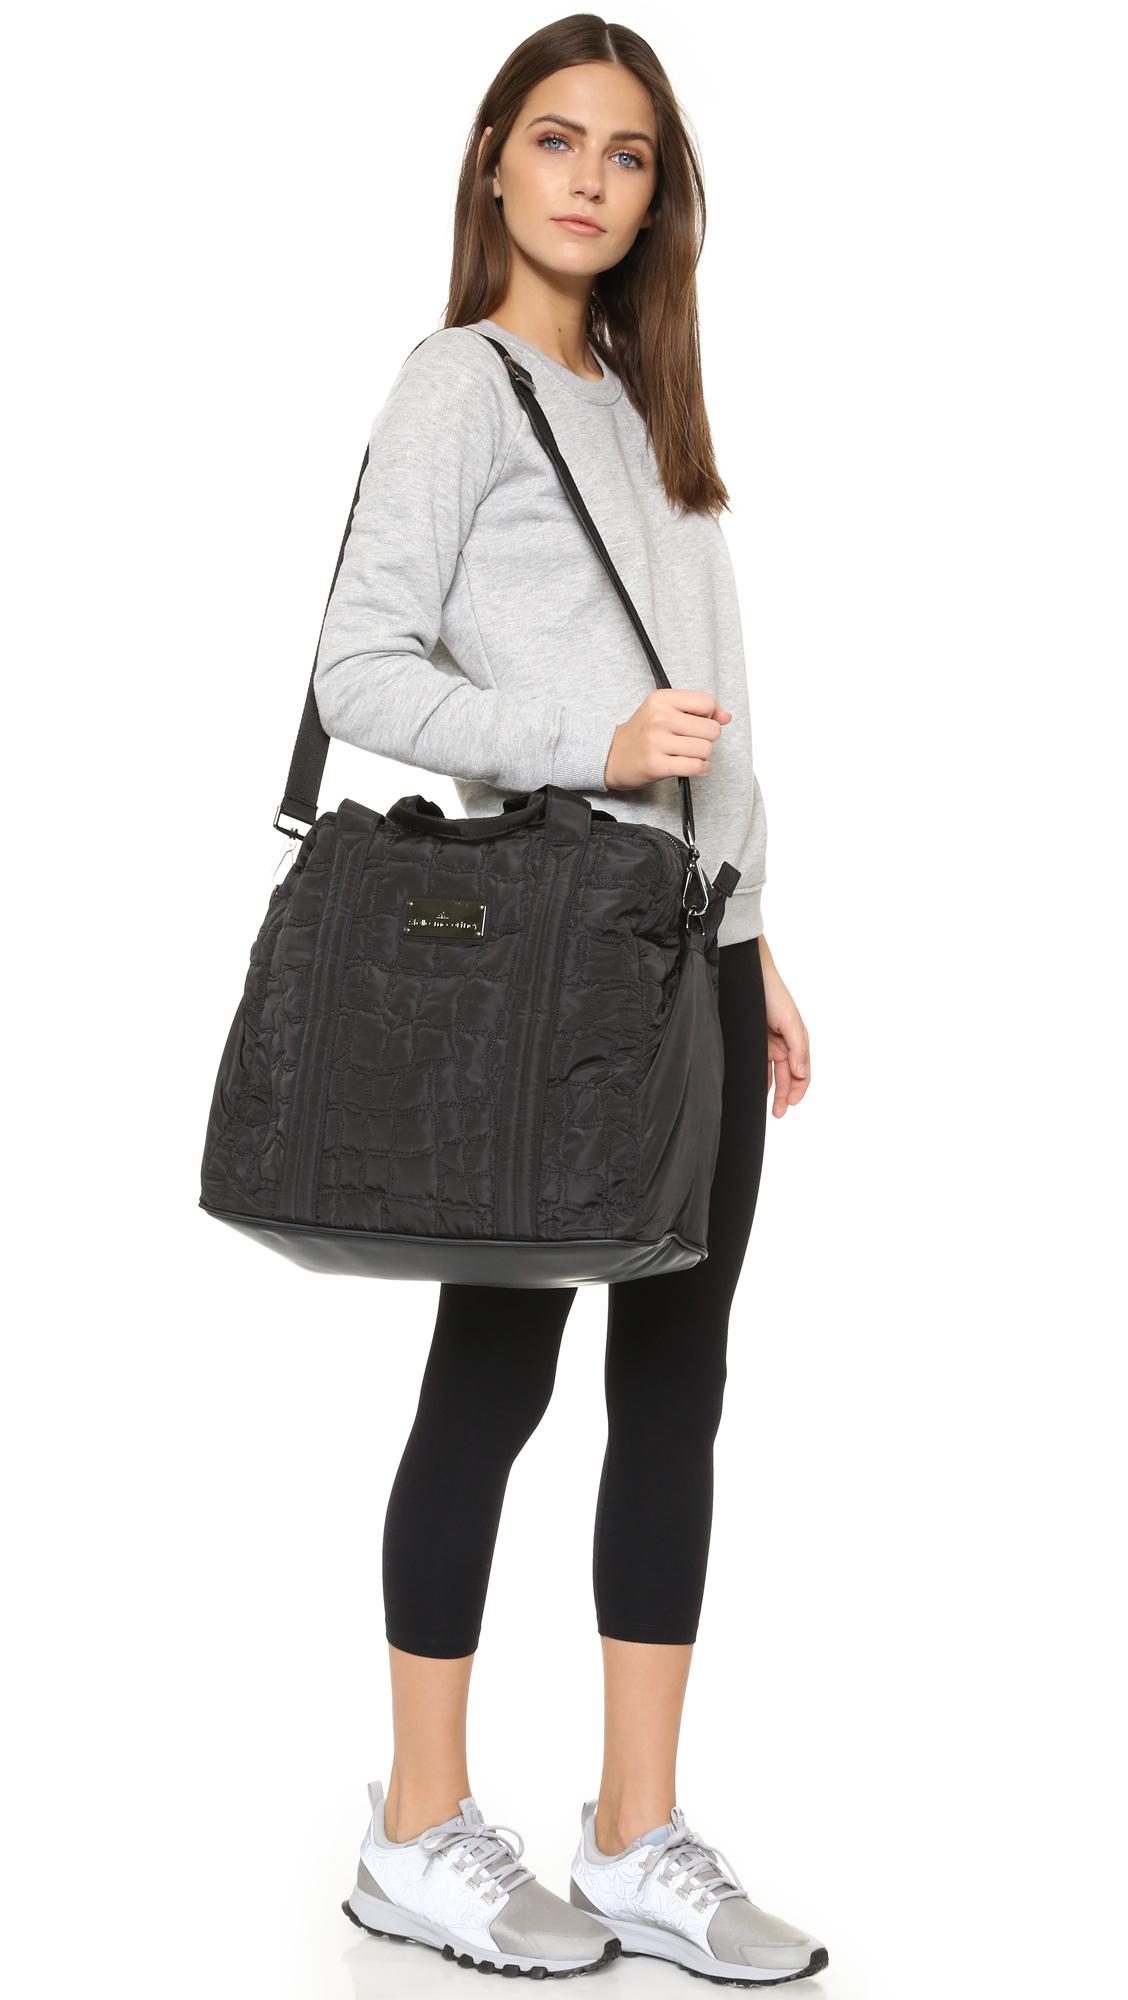 adidas by stella mccartney essentials bag in black lyst. Black Bedroom Furniture Sets. Home Design Ideas